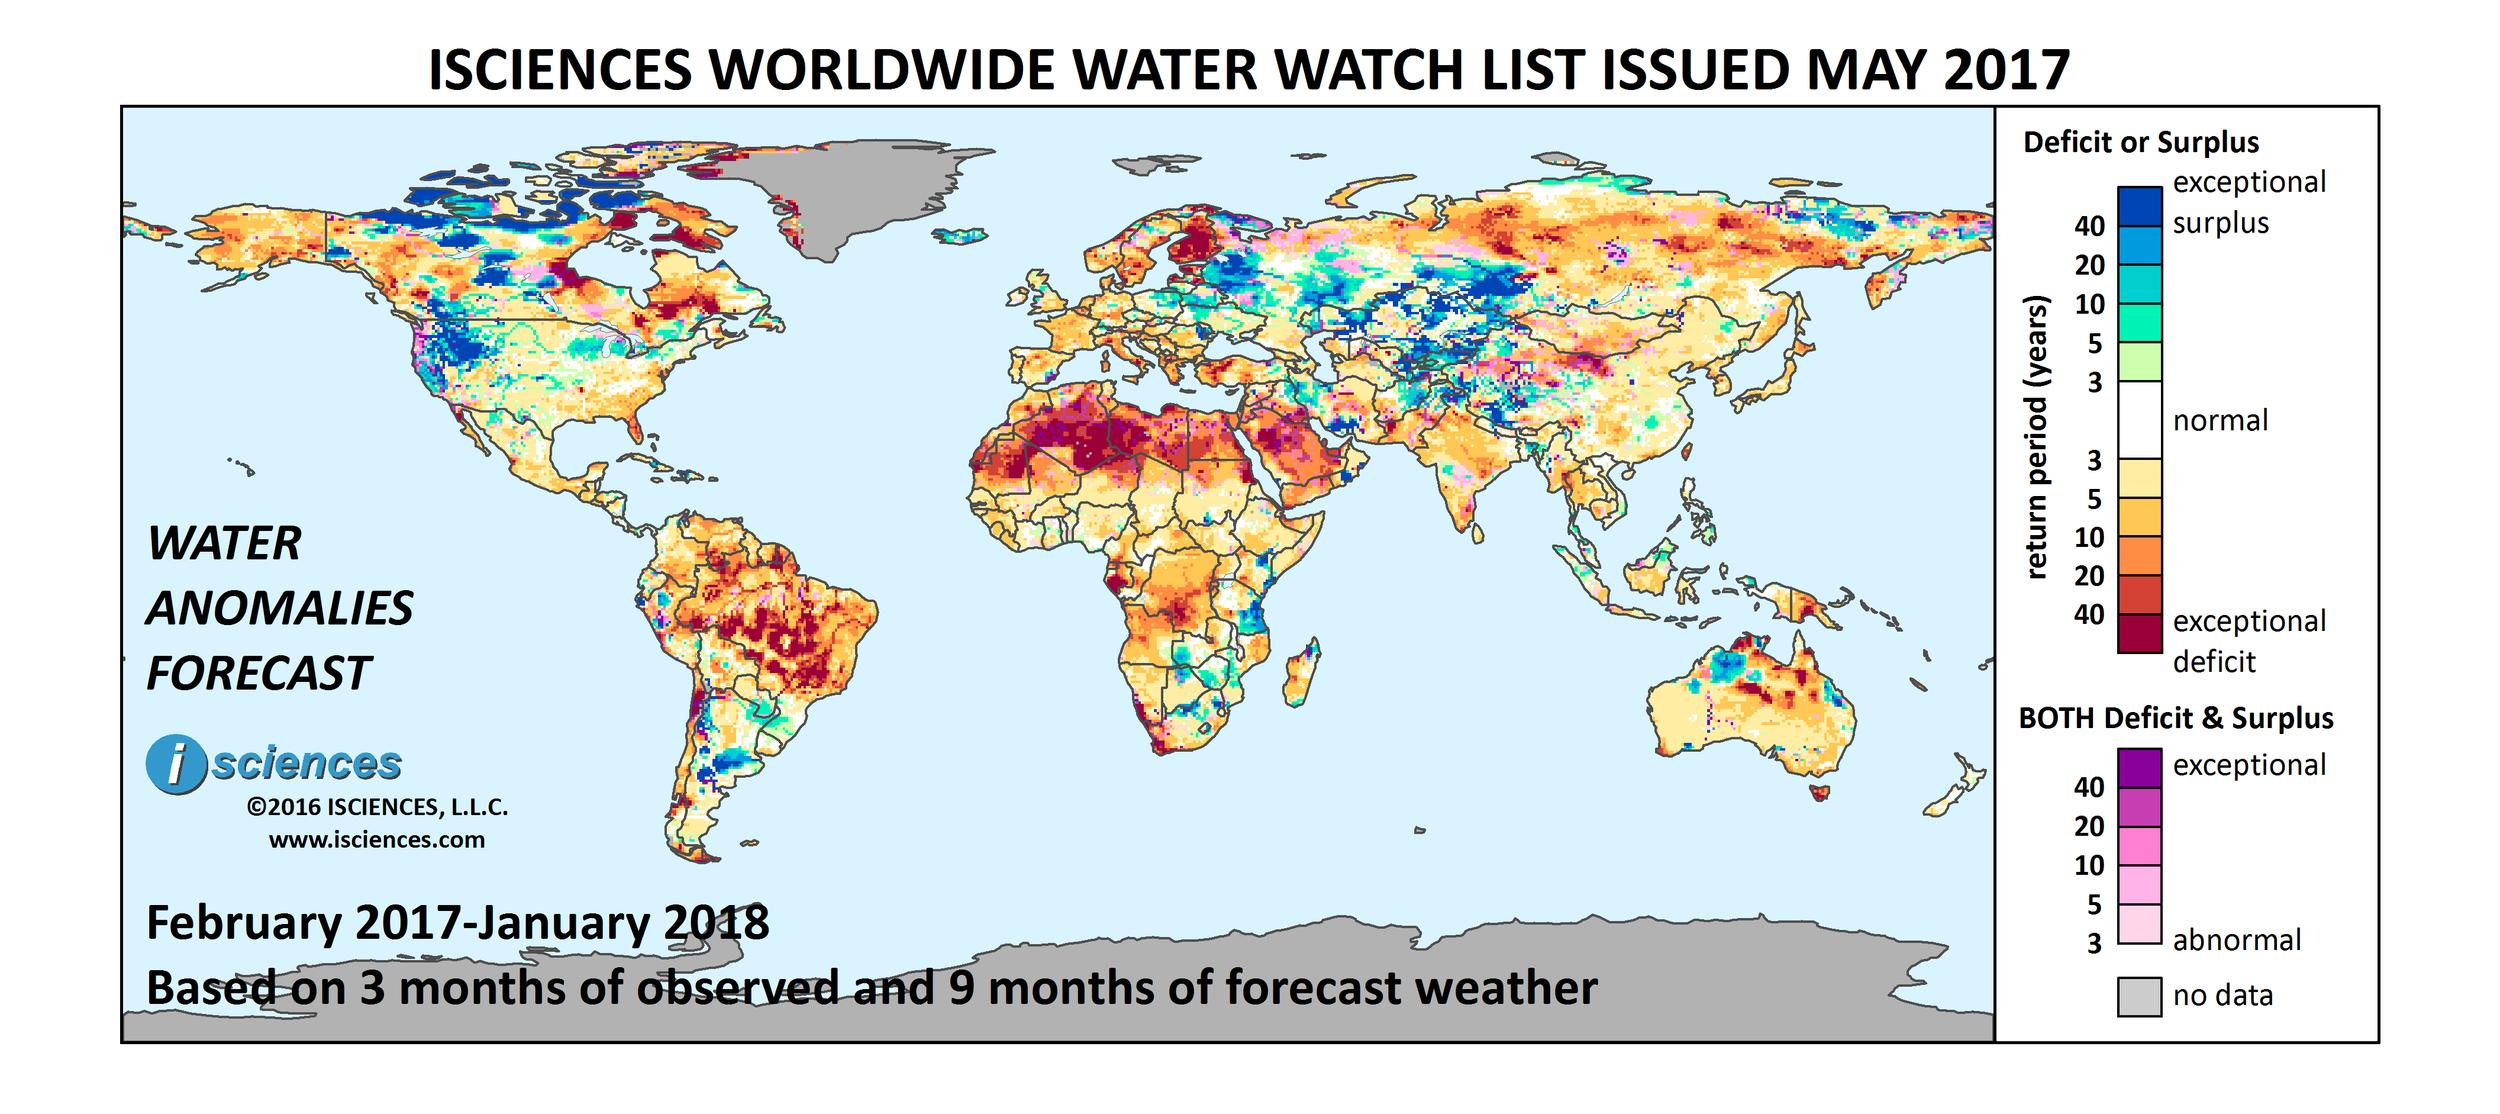 ISciences_Worldwide_Water_Watch_List_May2017